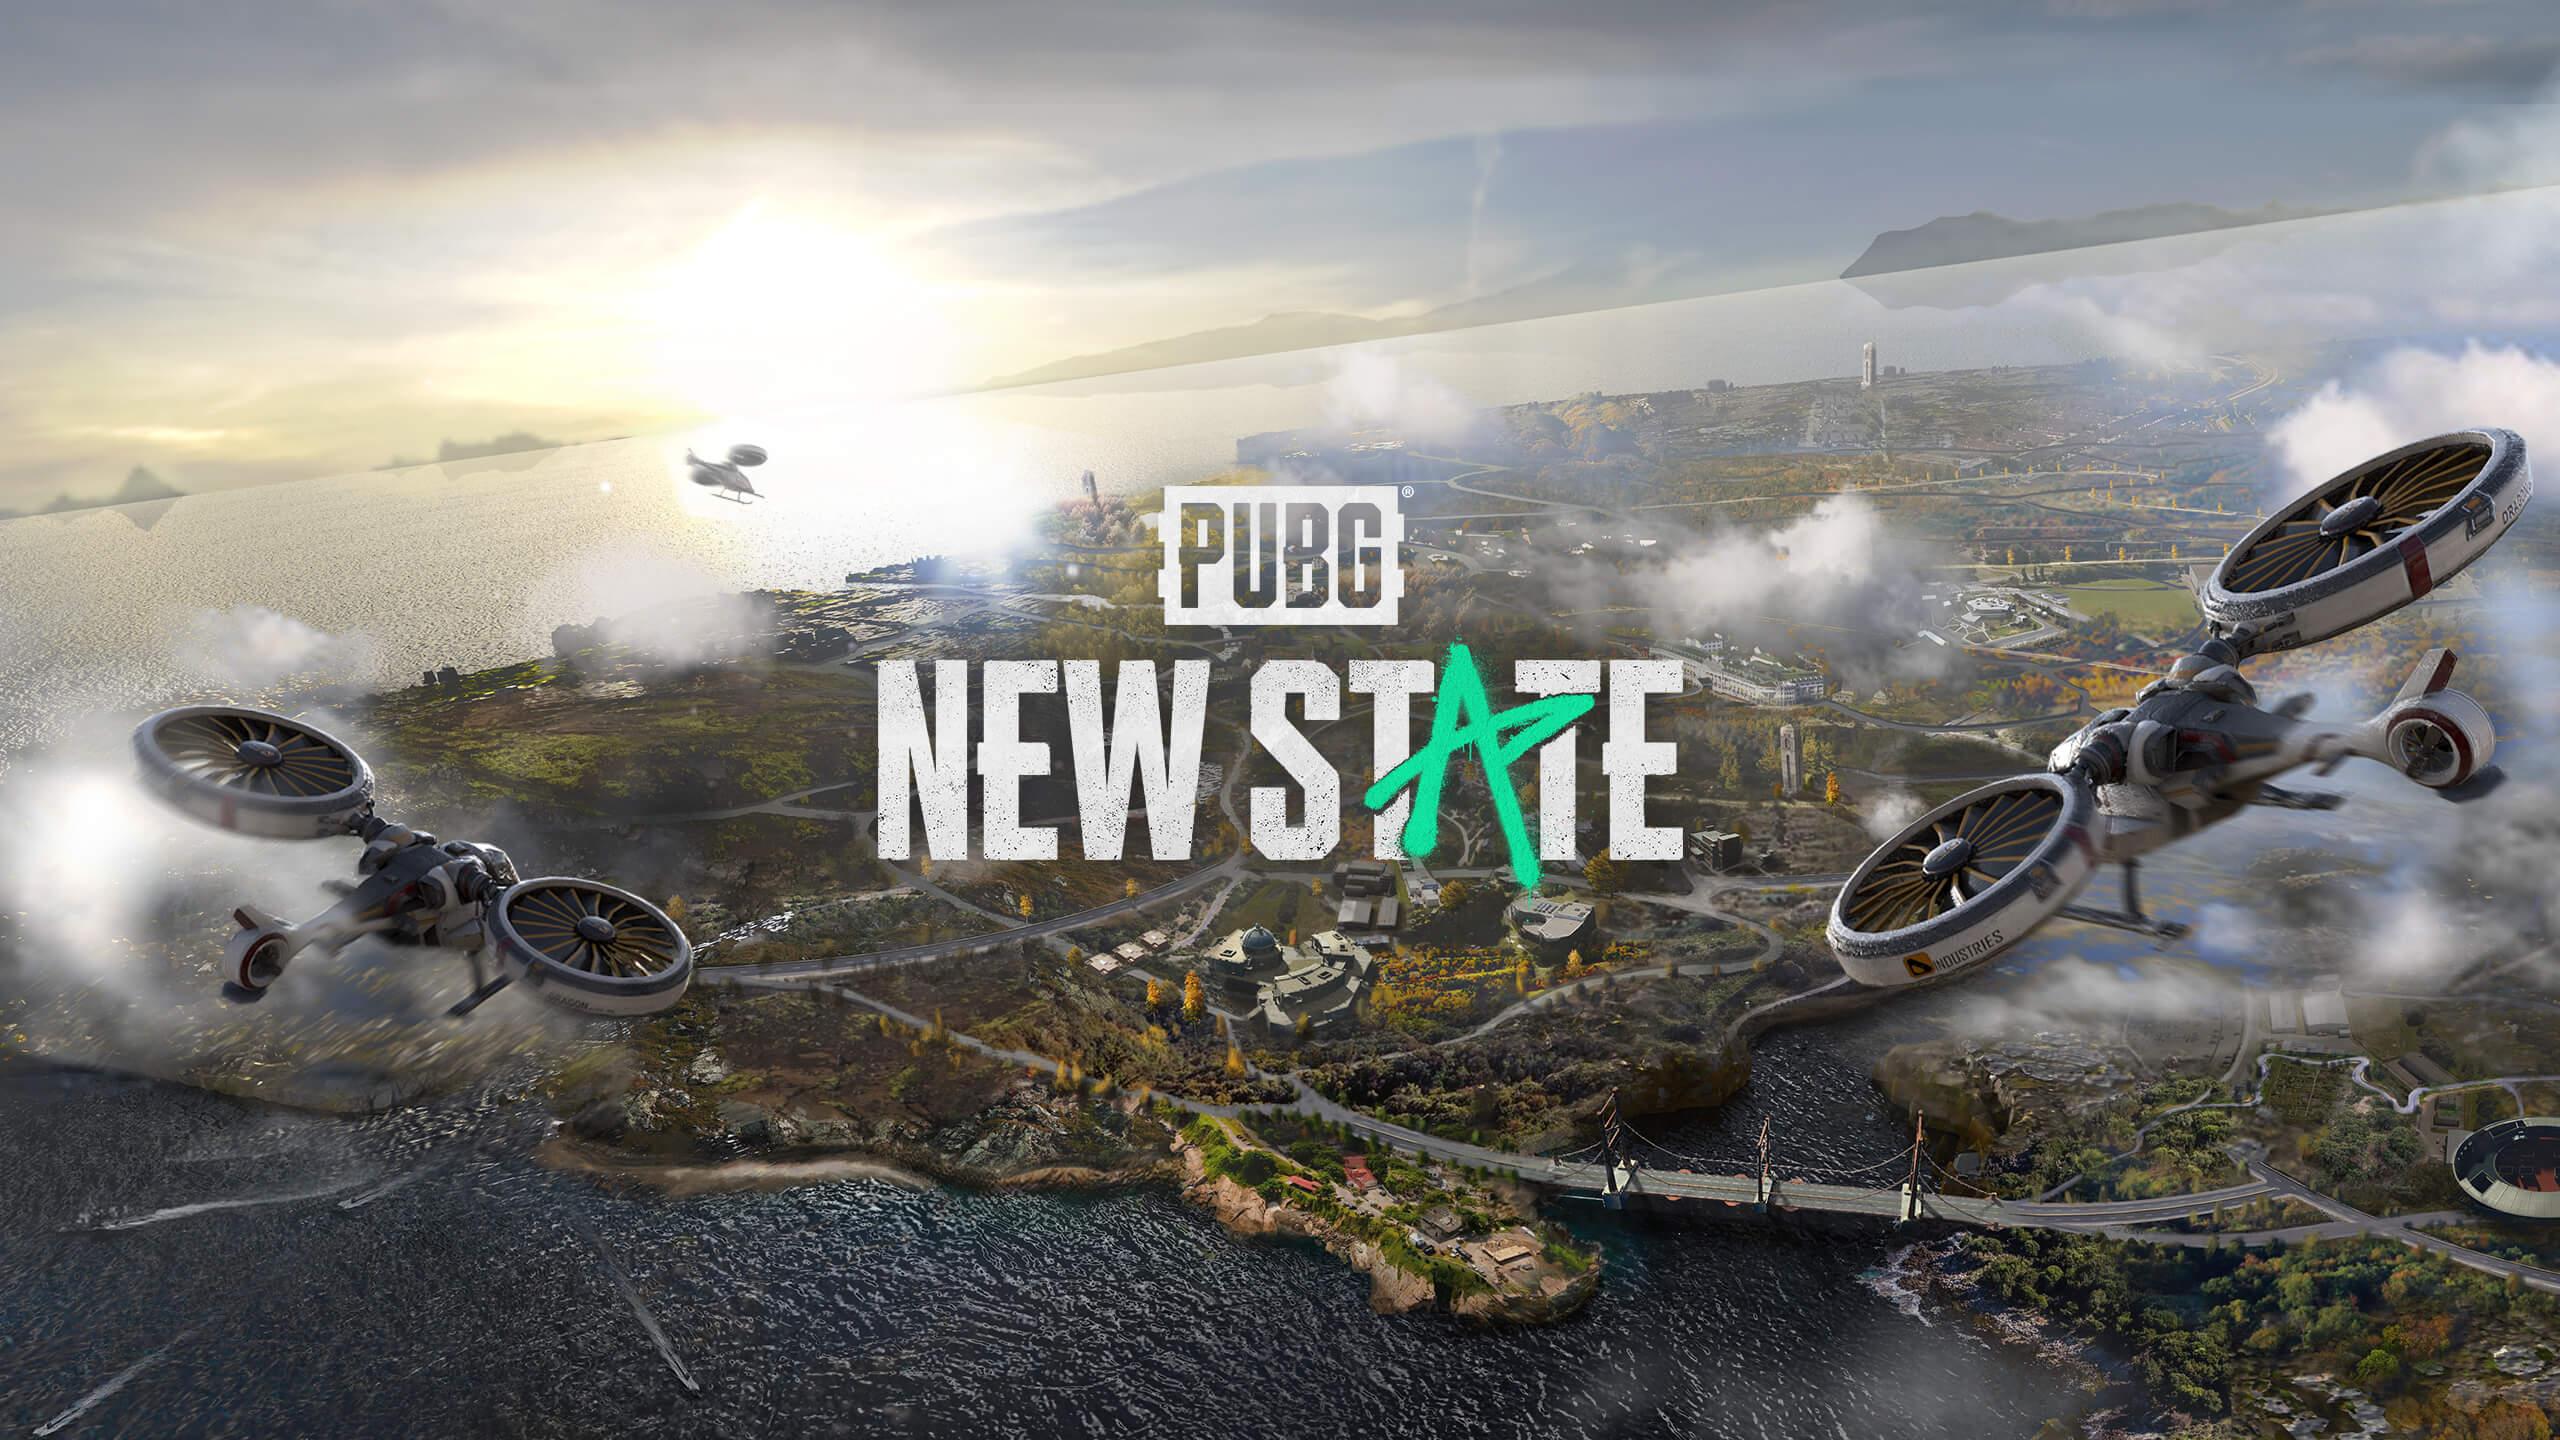 PUBG Mobile New State Announced